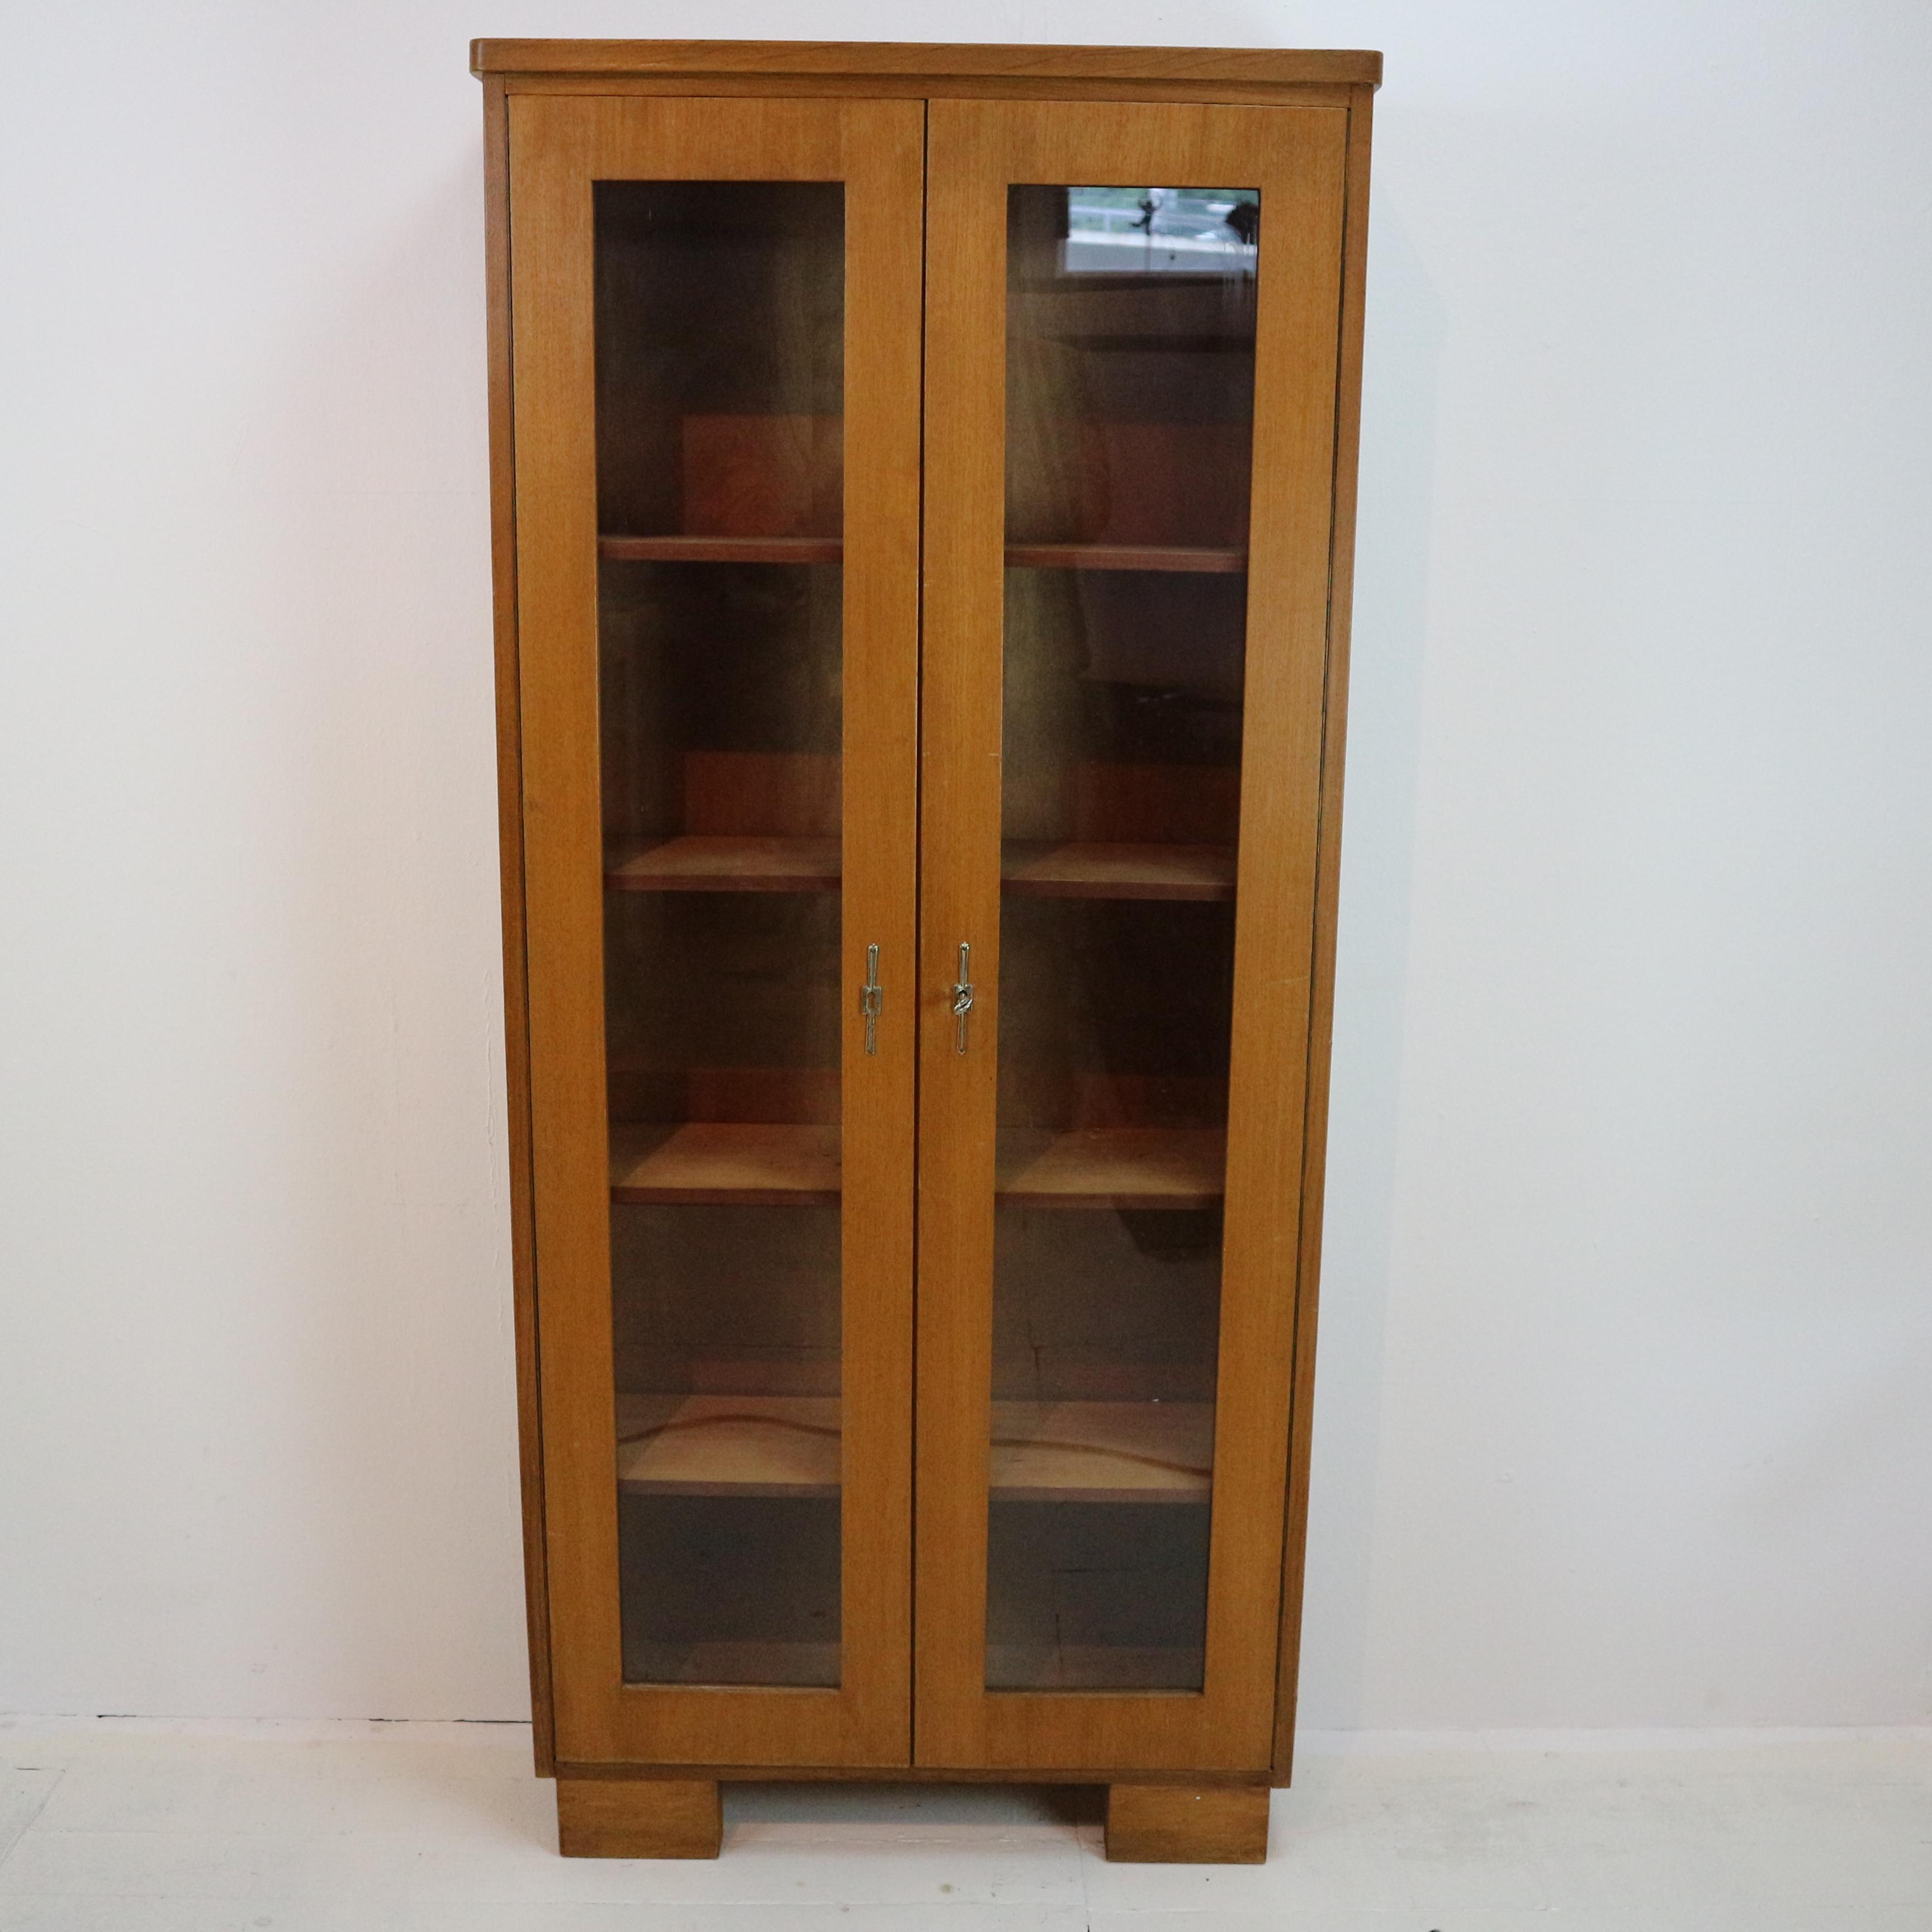 Deko Vitrine.Art Deko Vitrine Furniture Cupboards Shelves Auctionet